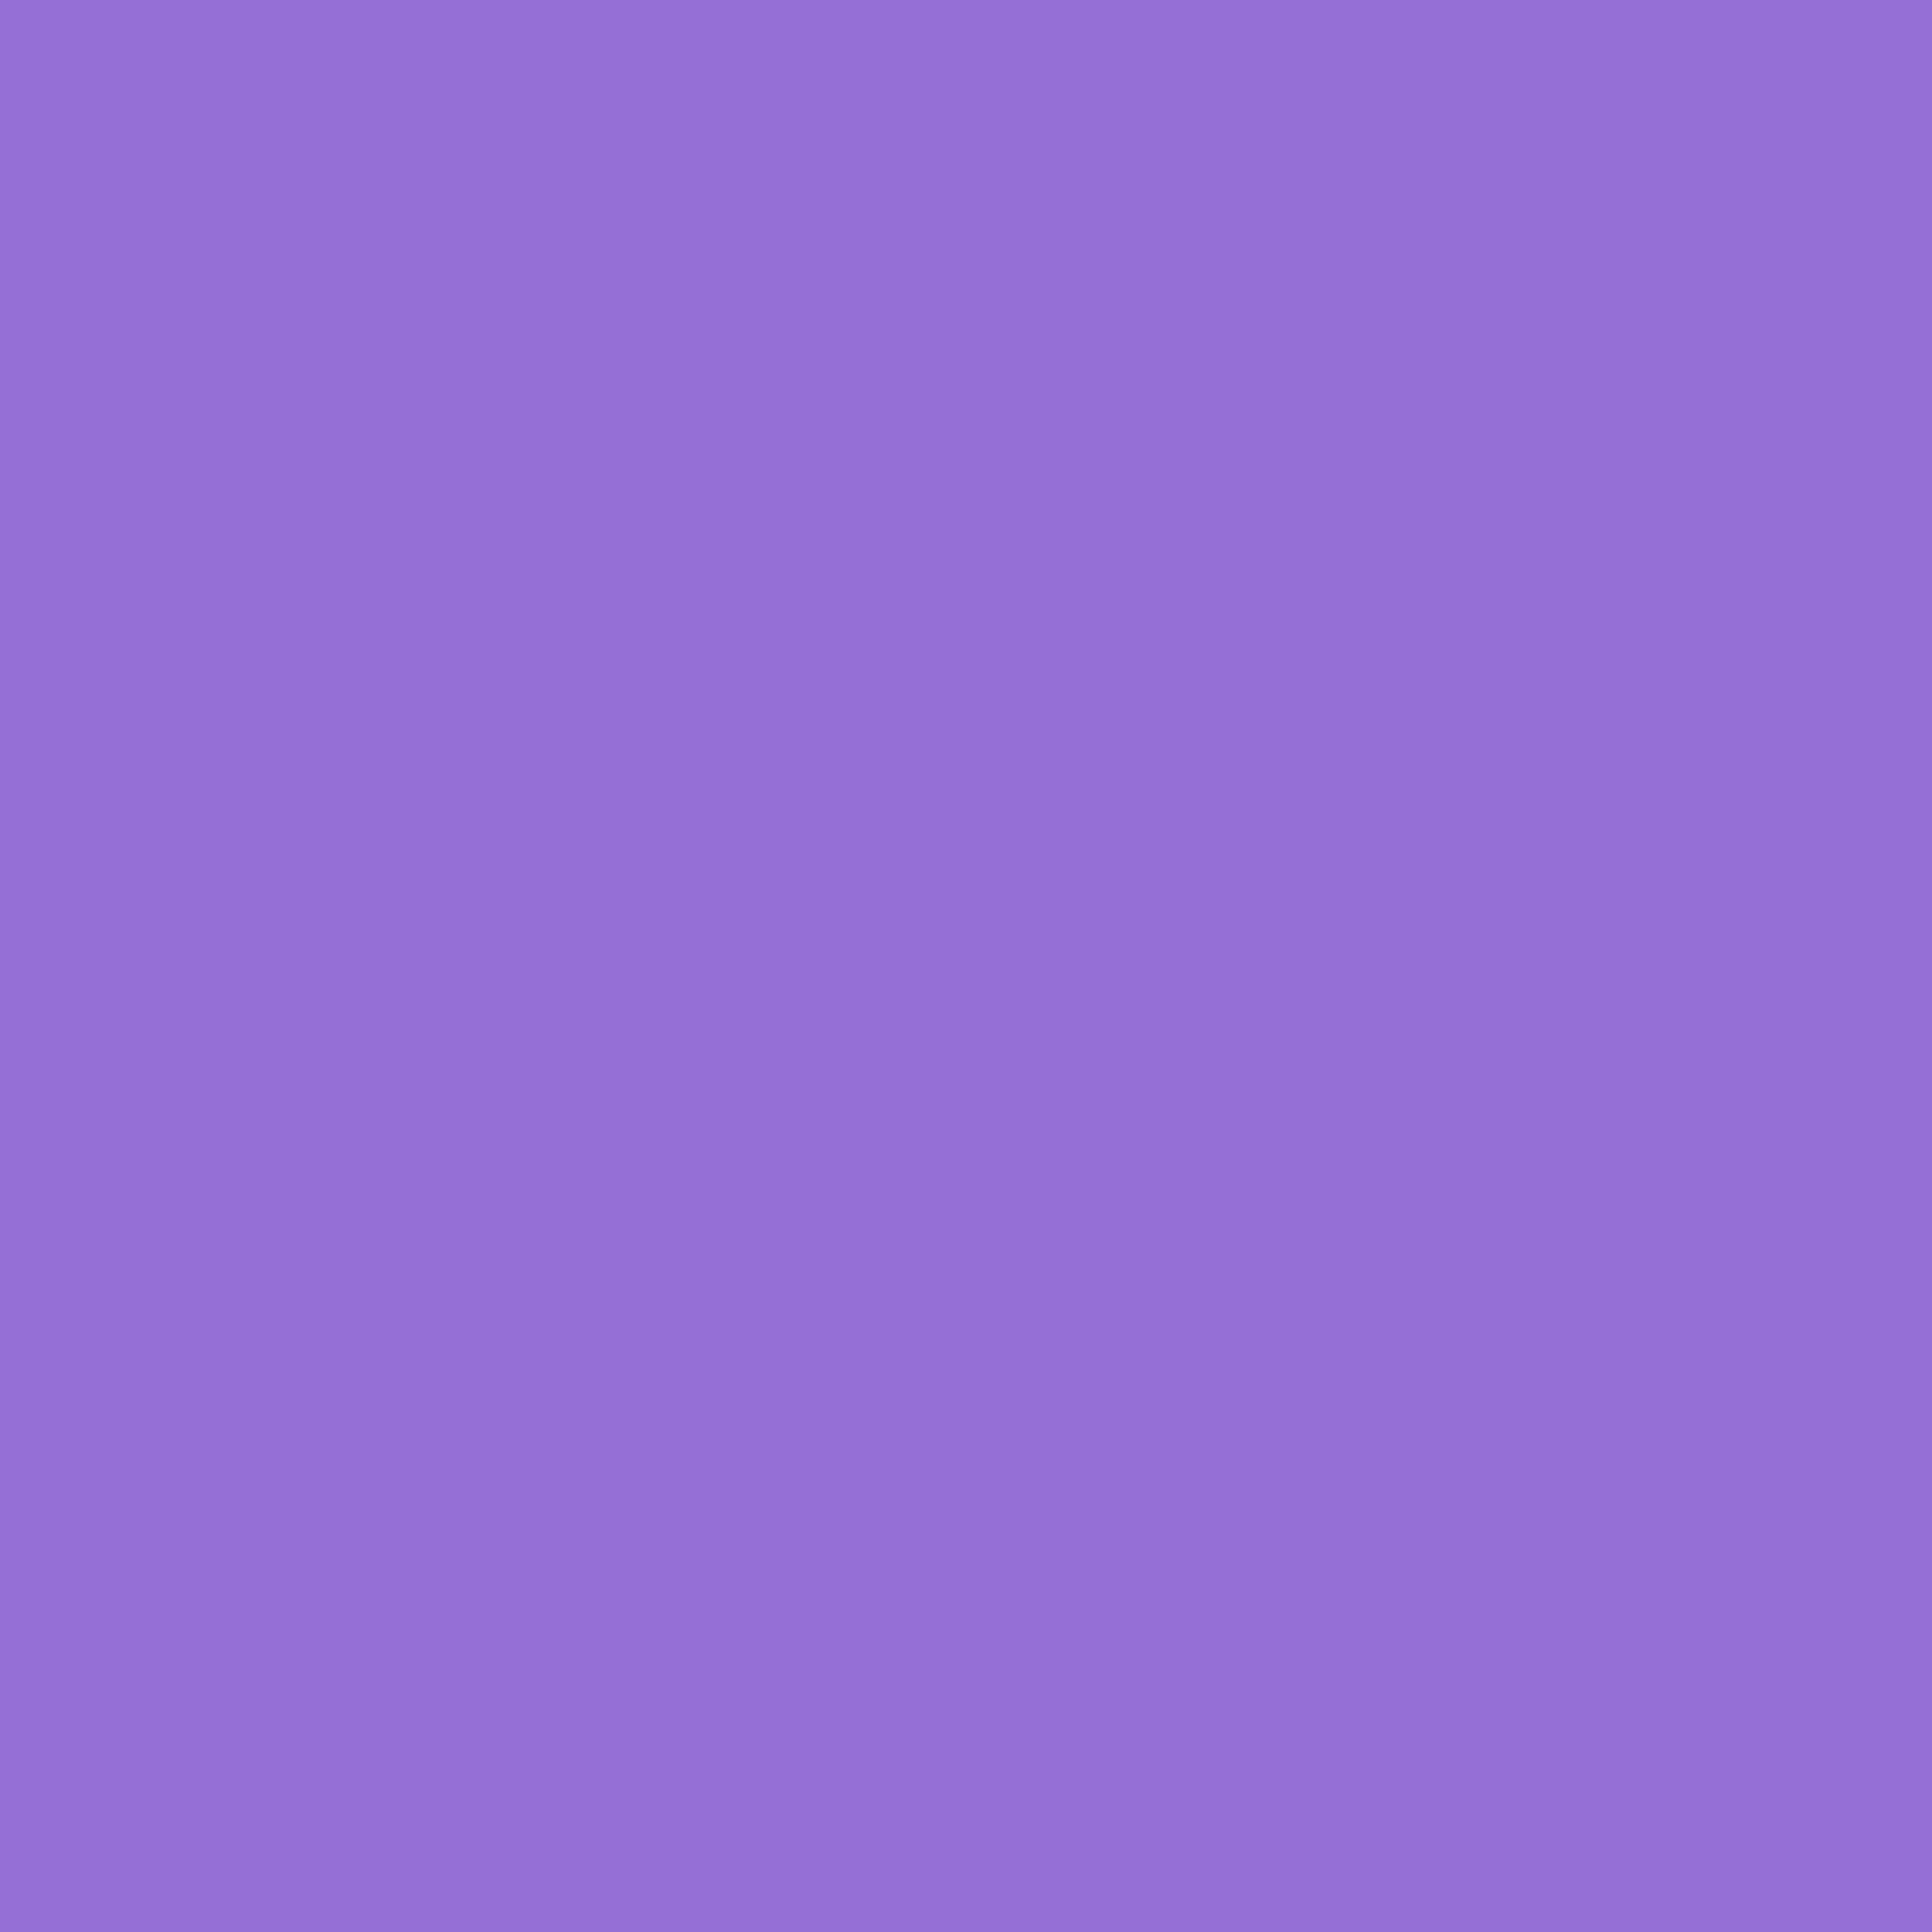 3600x3600 Dark Pastel Purple Solid Color Background